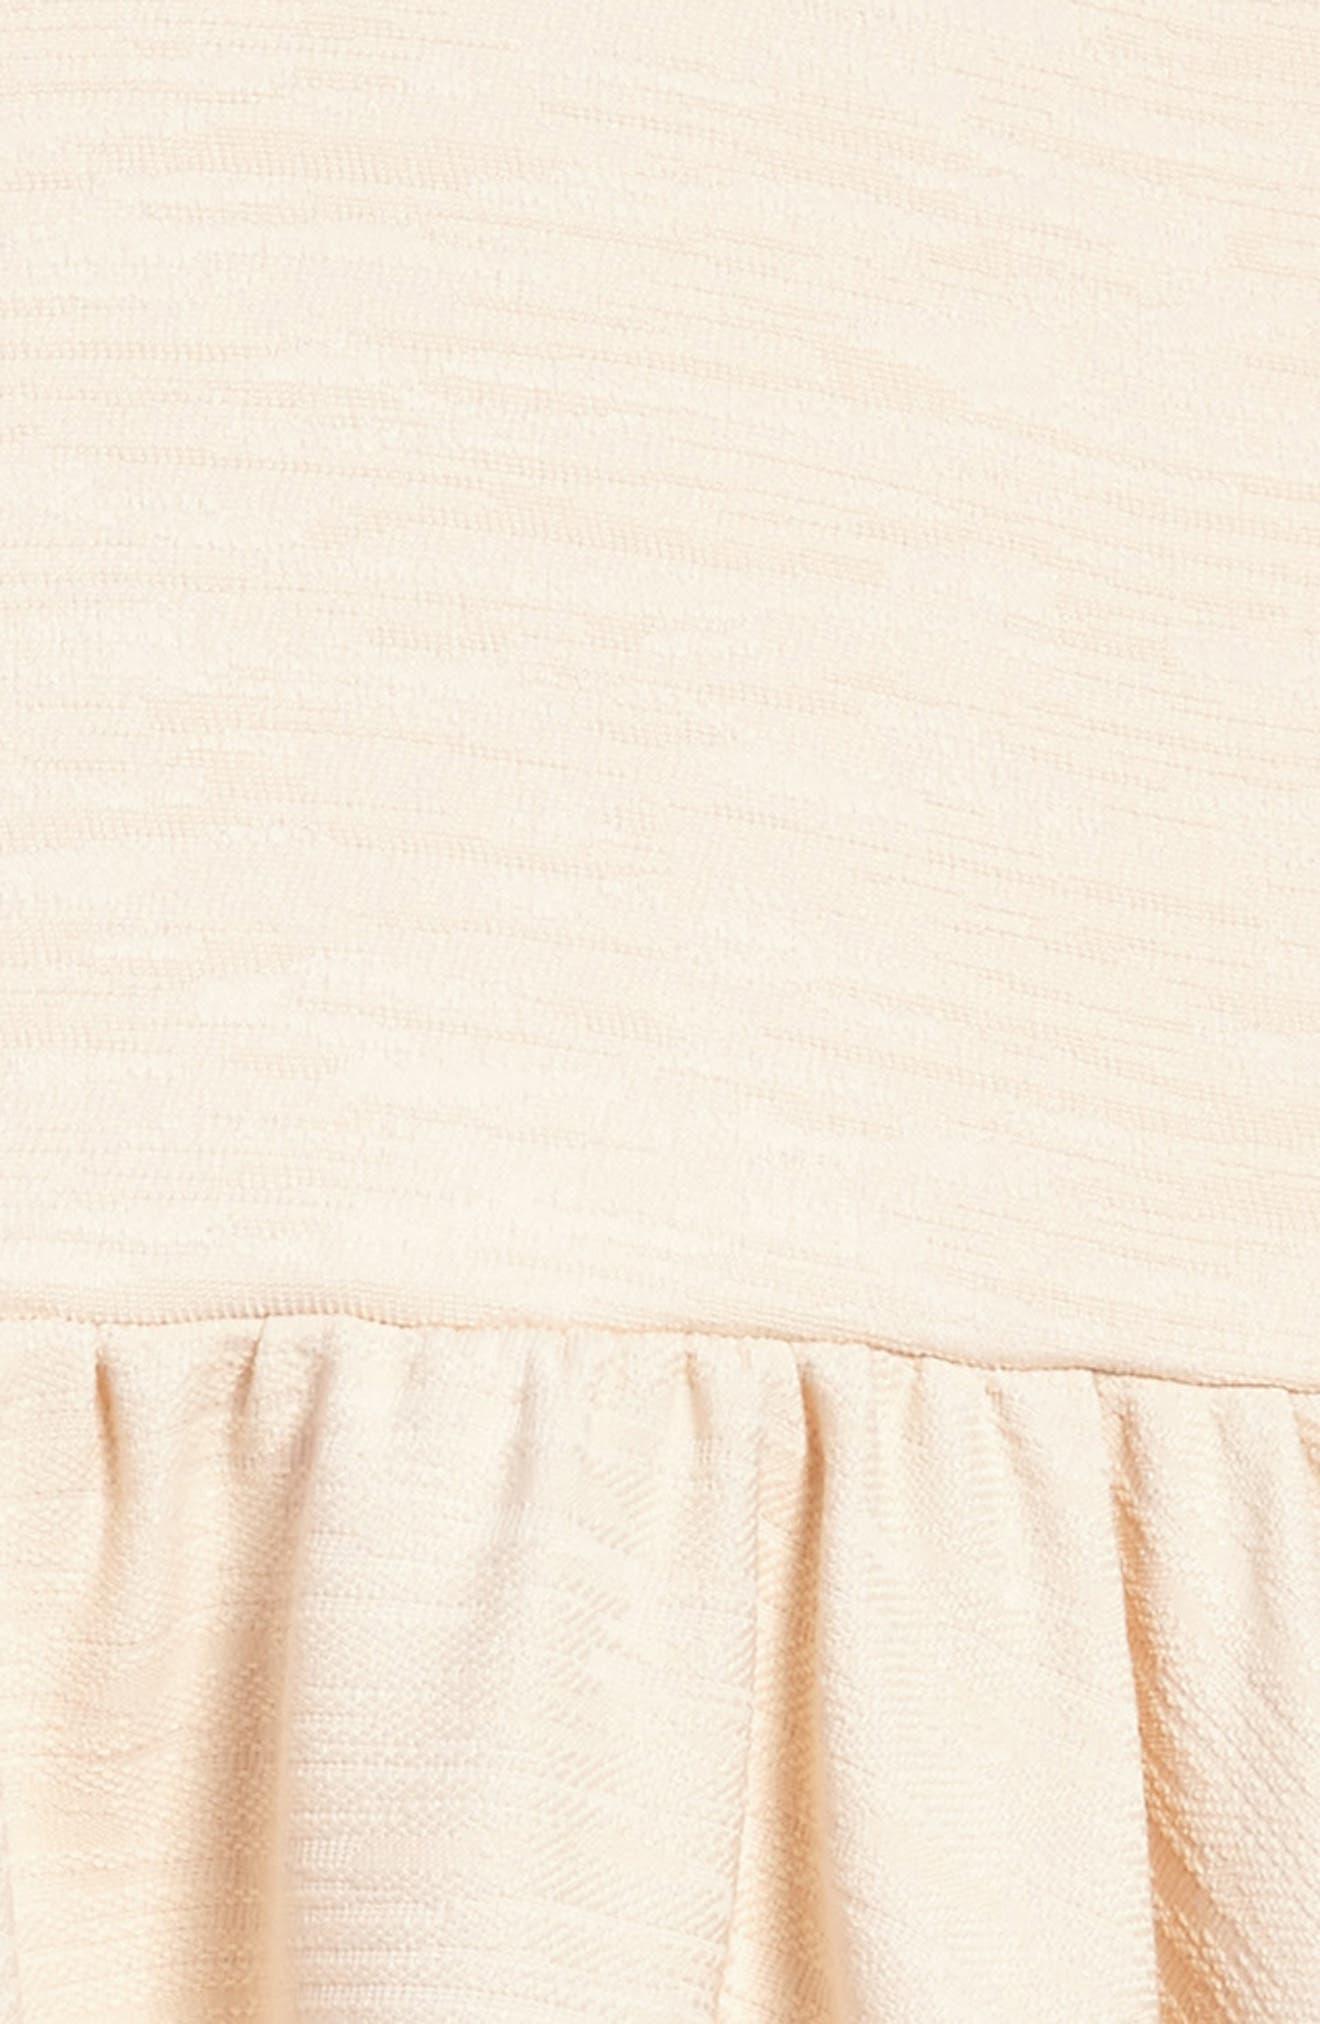 Stephanie Halter Dress,                             Alternate thumbnail 3, color,                             260